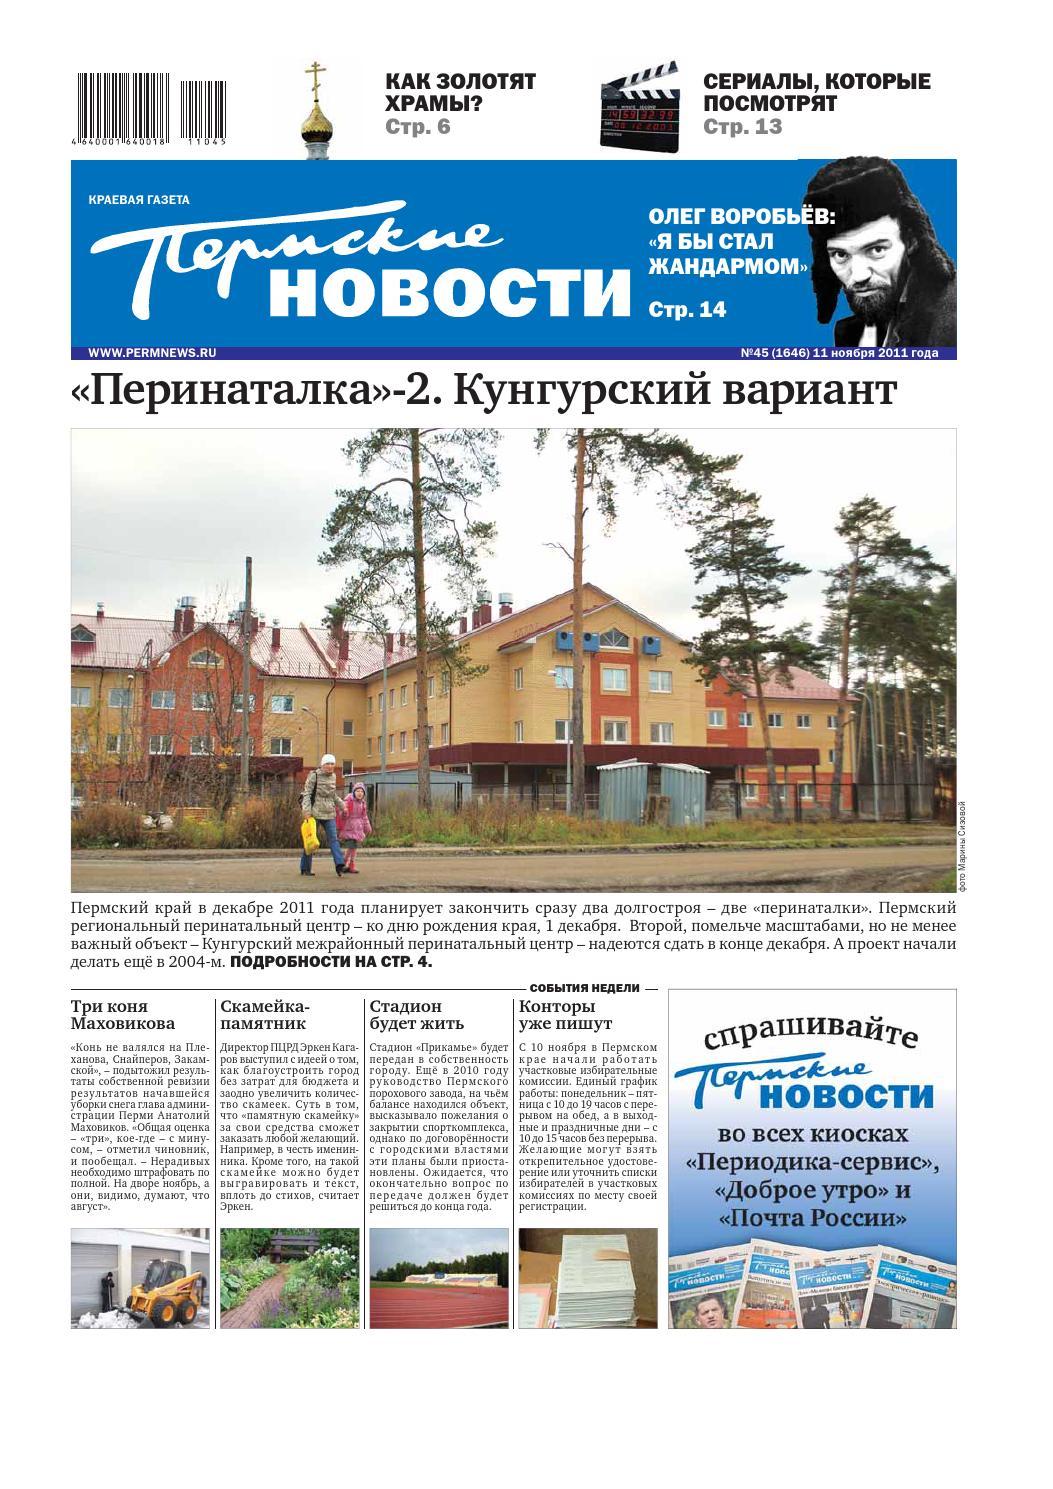 Новости программа передач омск